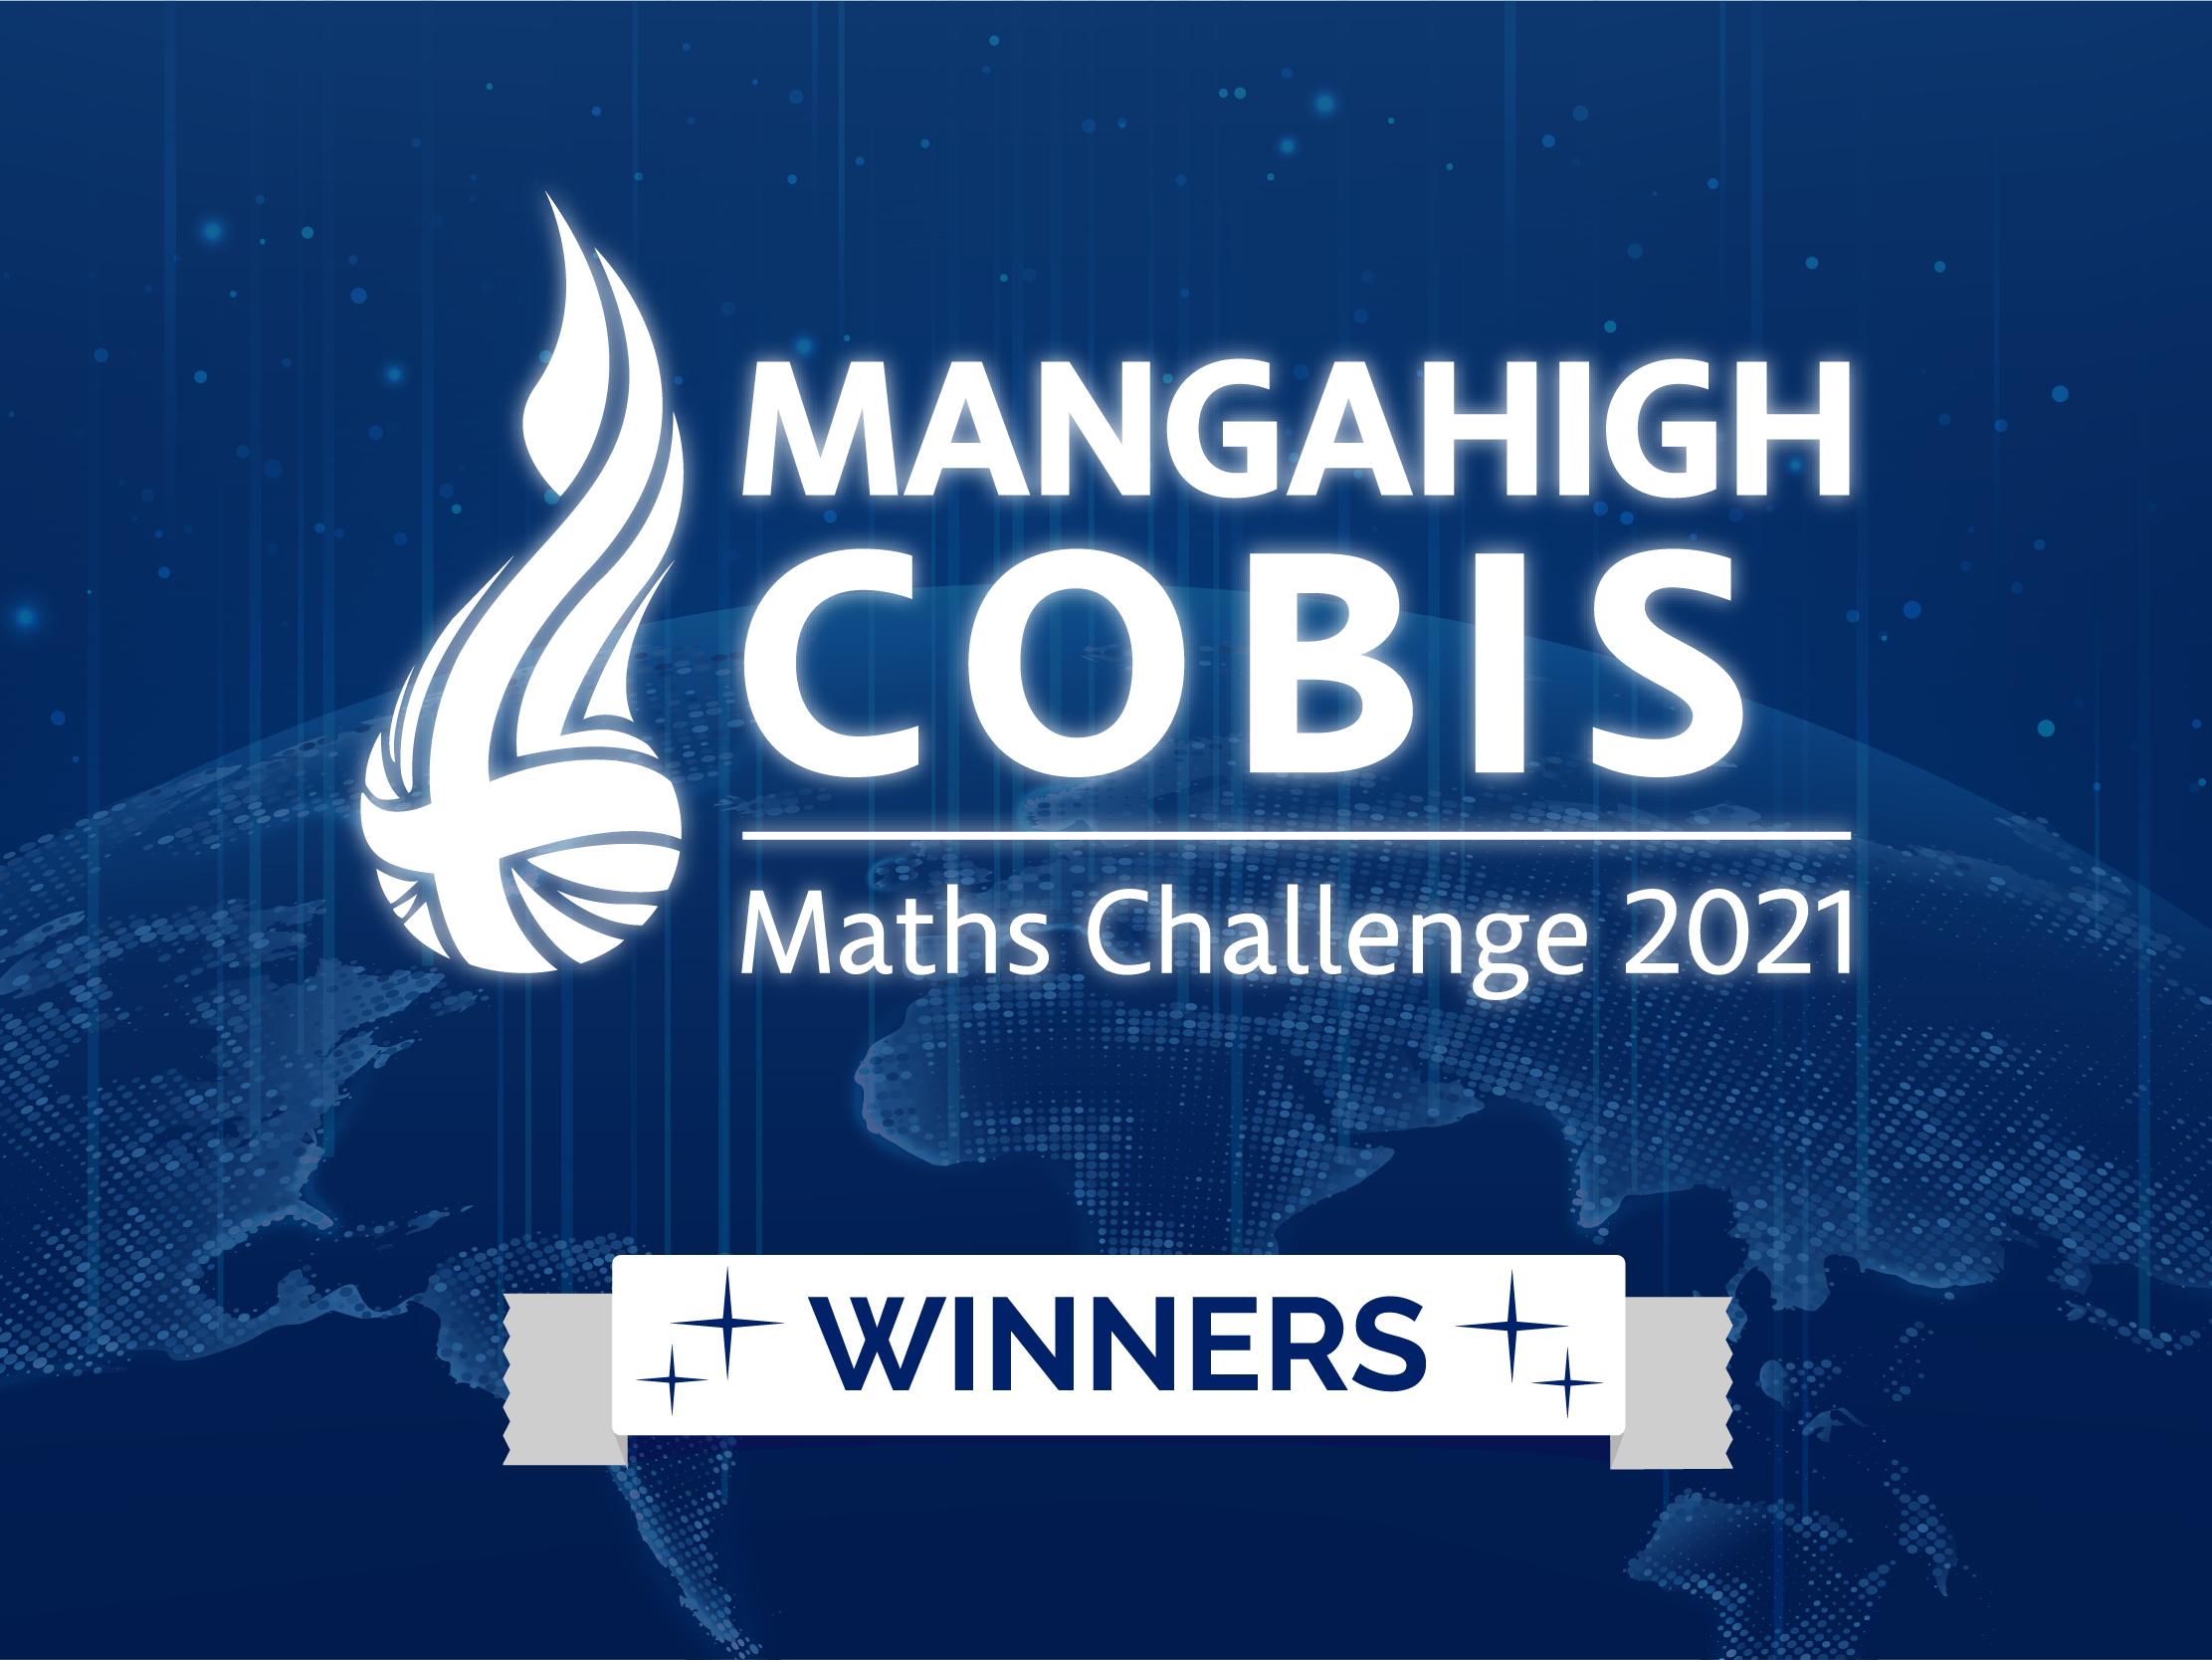 The Champions of the Mangahigh COBIS Maths Challenge!